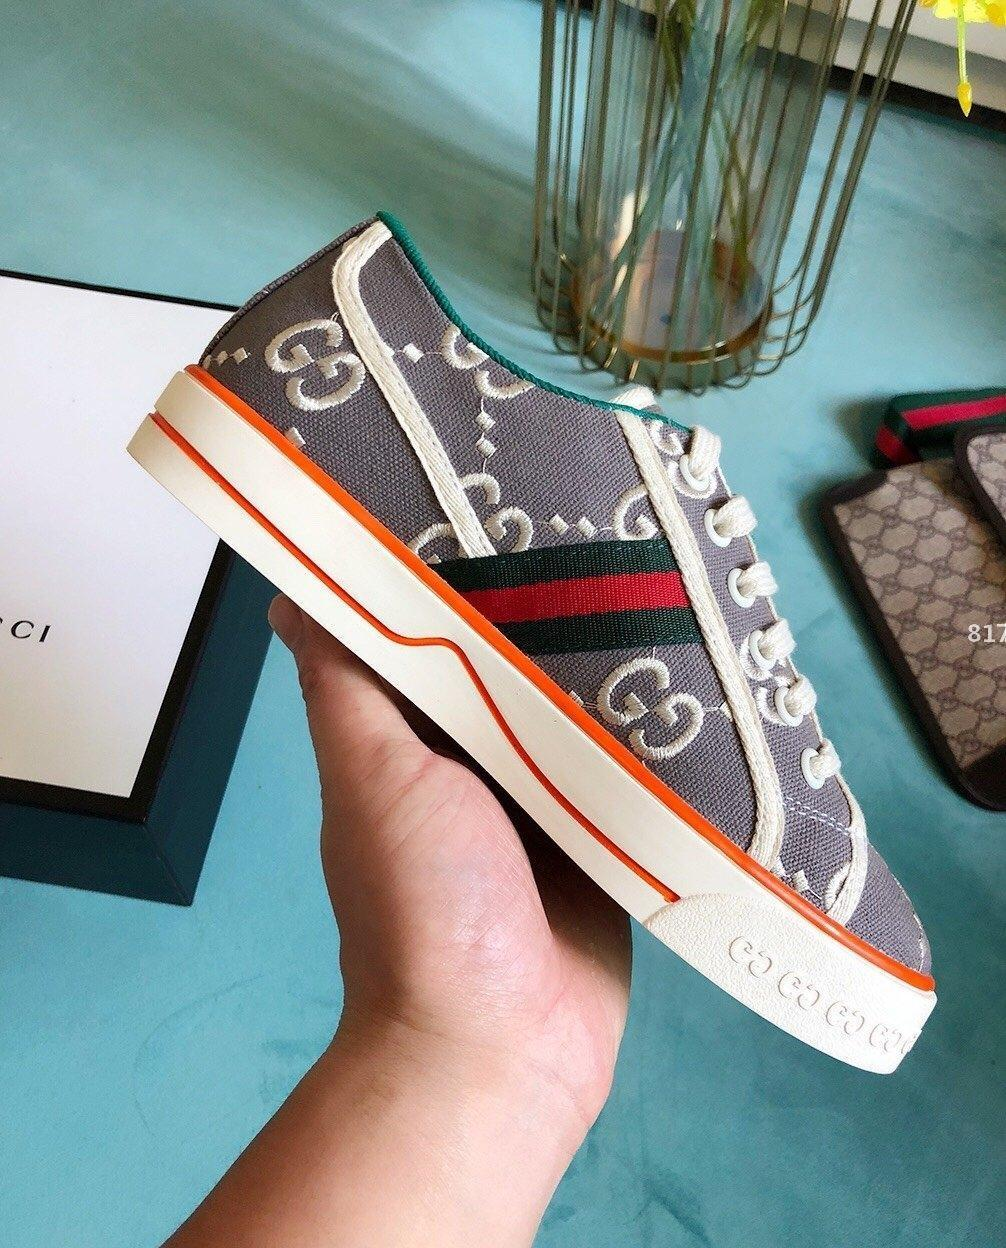 design de luxe 2020 New Woman Chaussures de mode avec Origin Box Top Luxe Sneakers Lace up Casual Sport Chaussures Femme